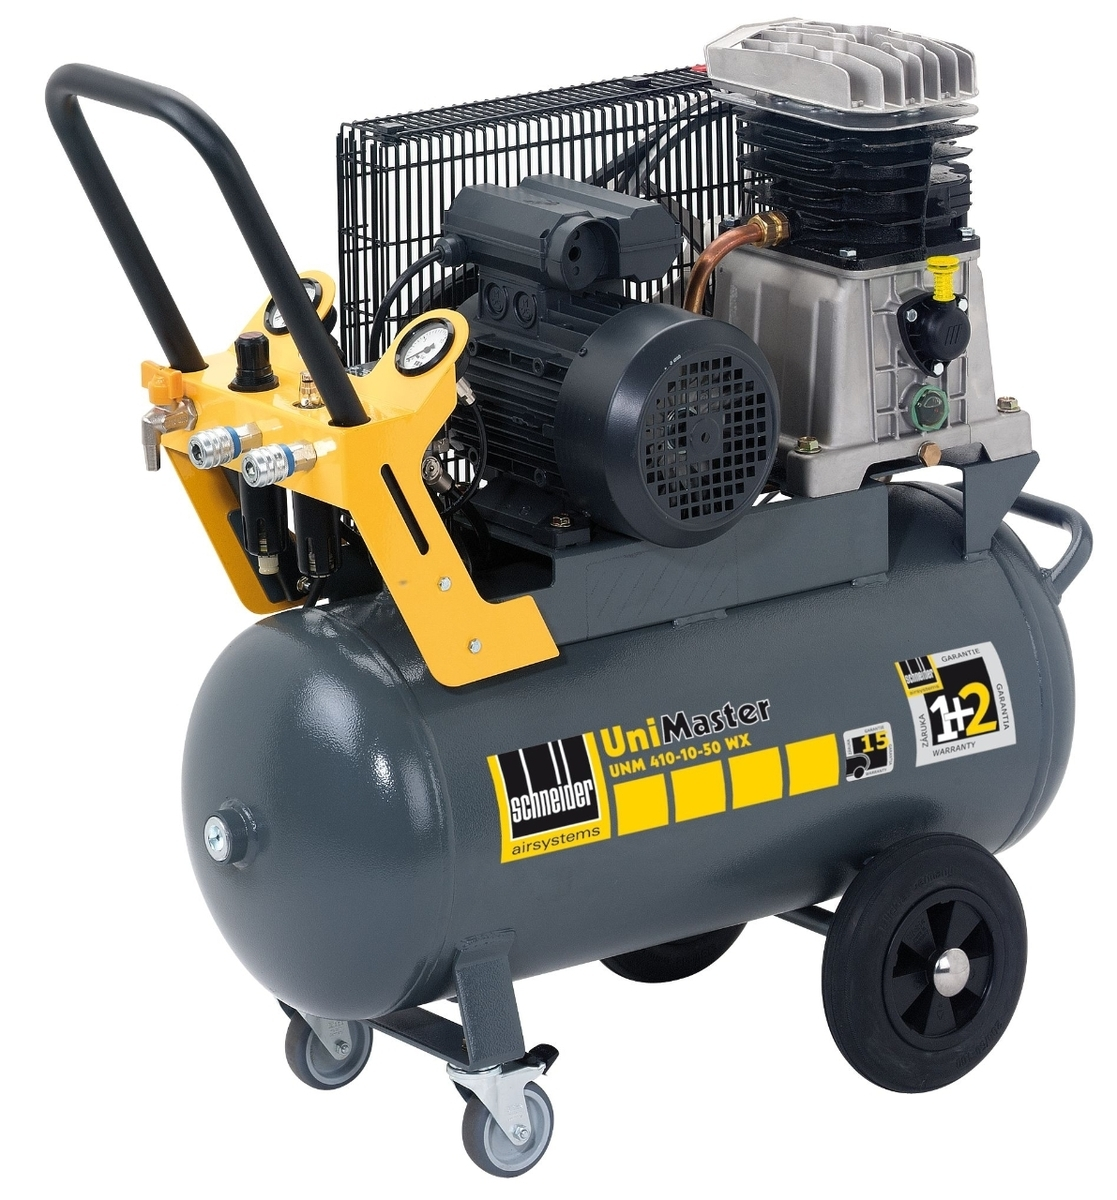 Vzduchový kompresor 50 l 230 V, olejový dvouválcový - Schneider UNM 410-10-50 W